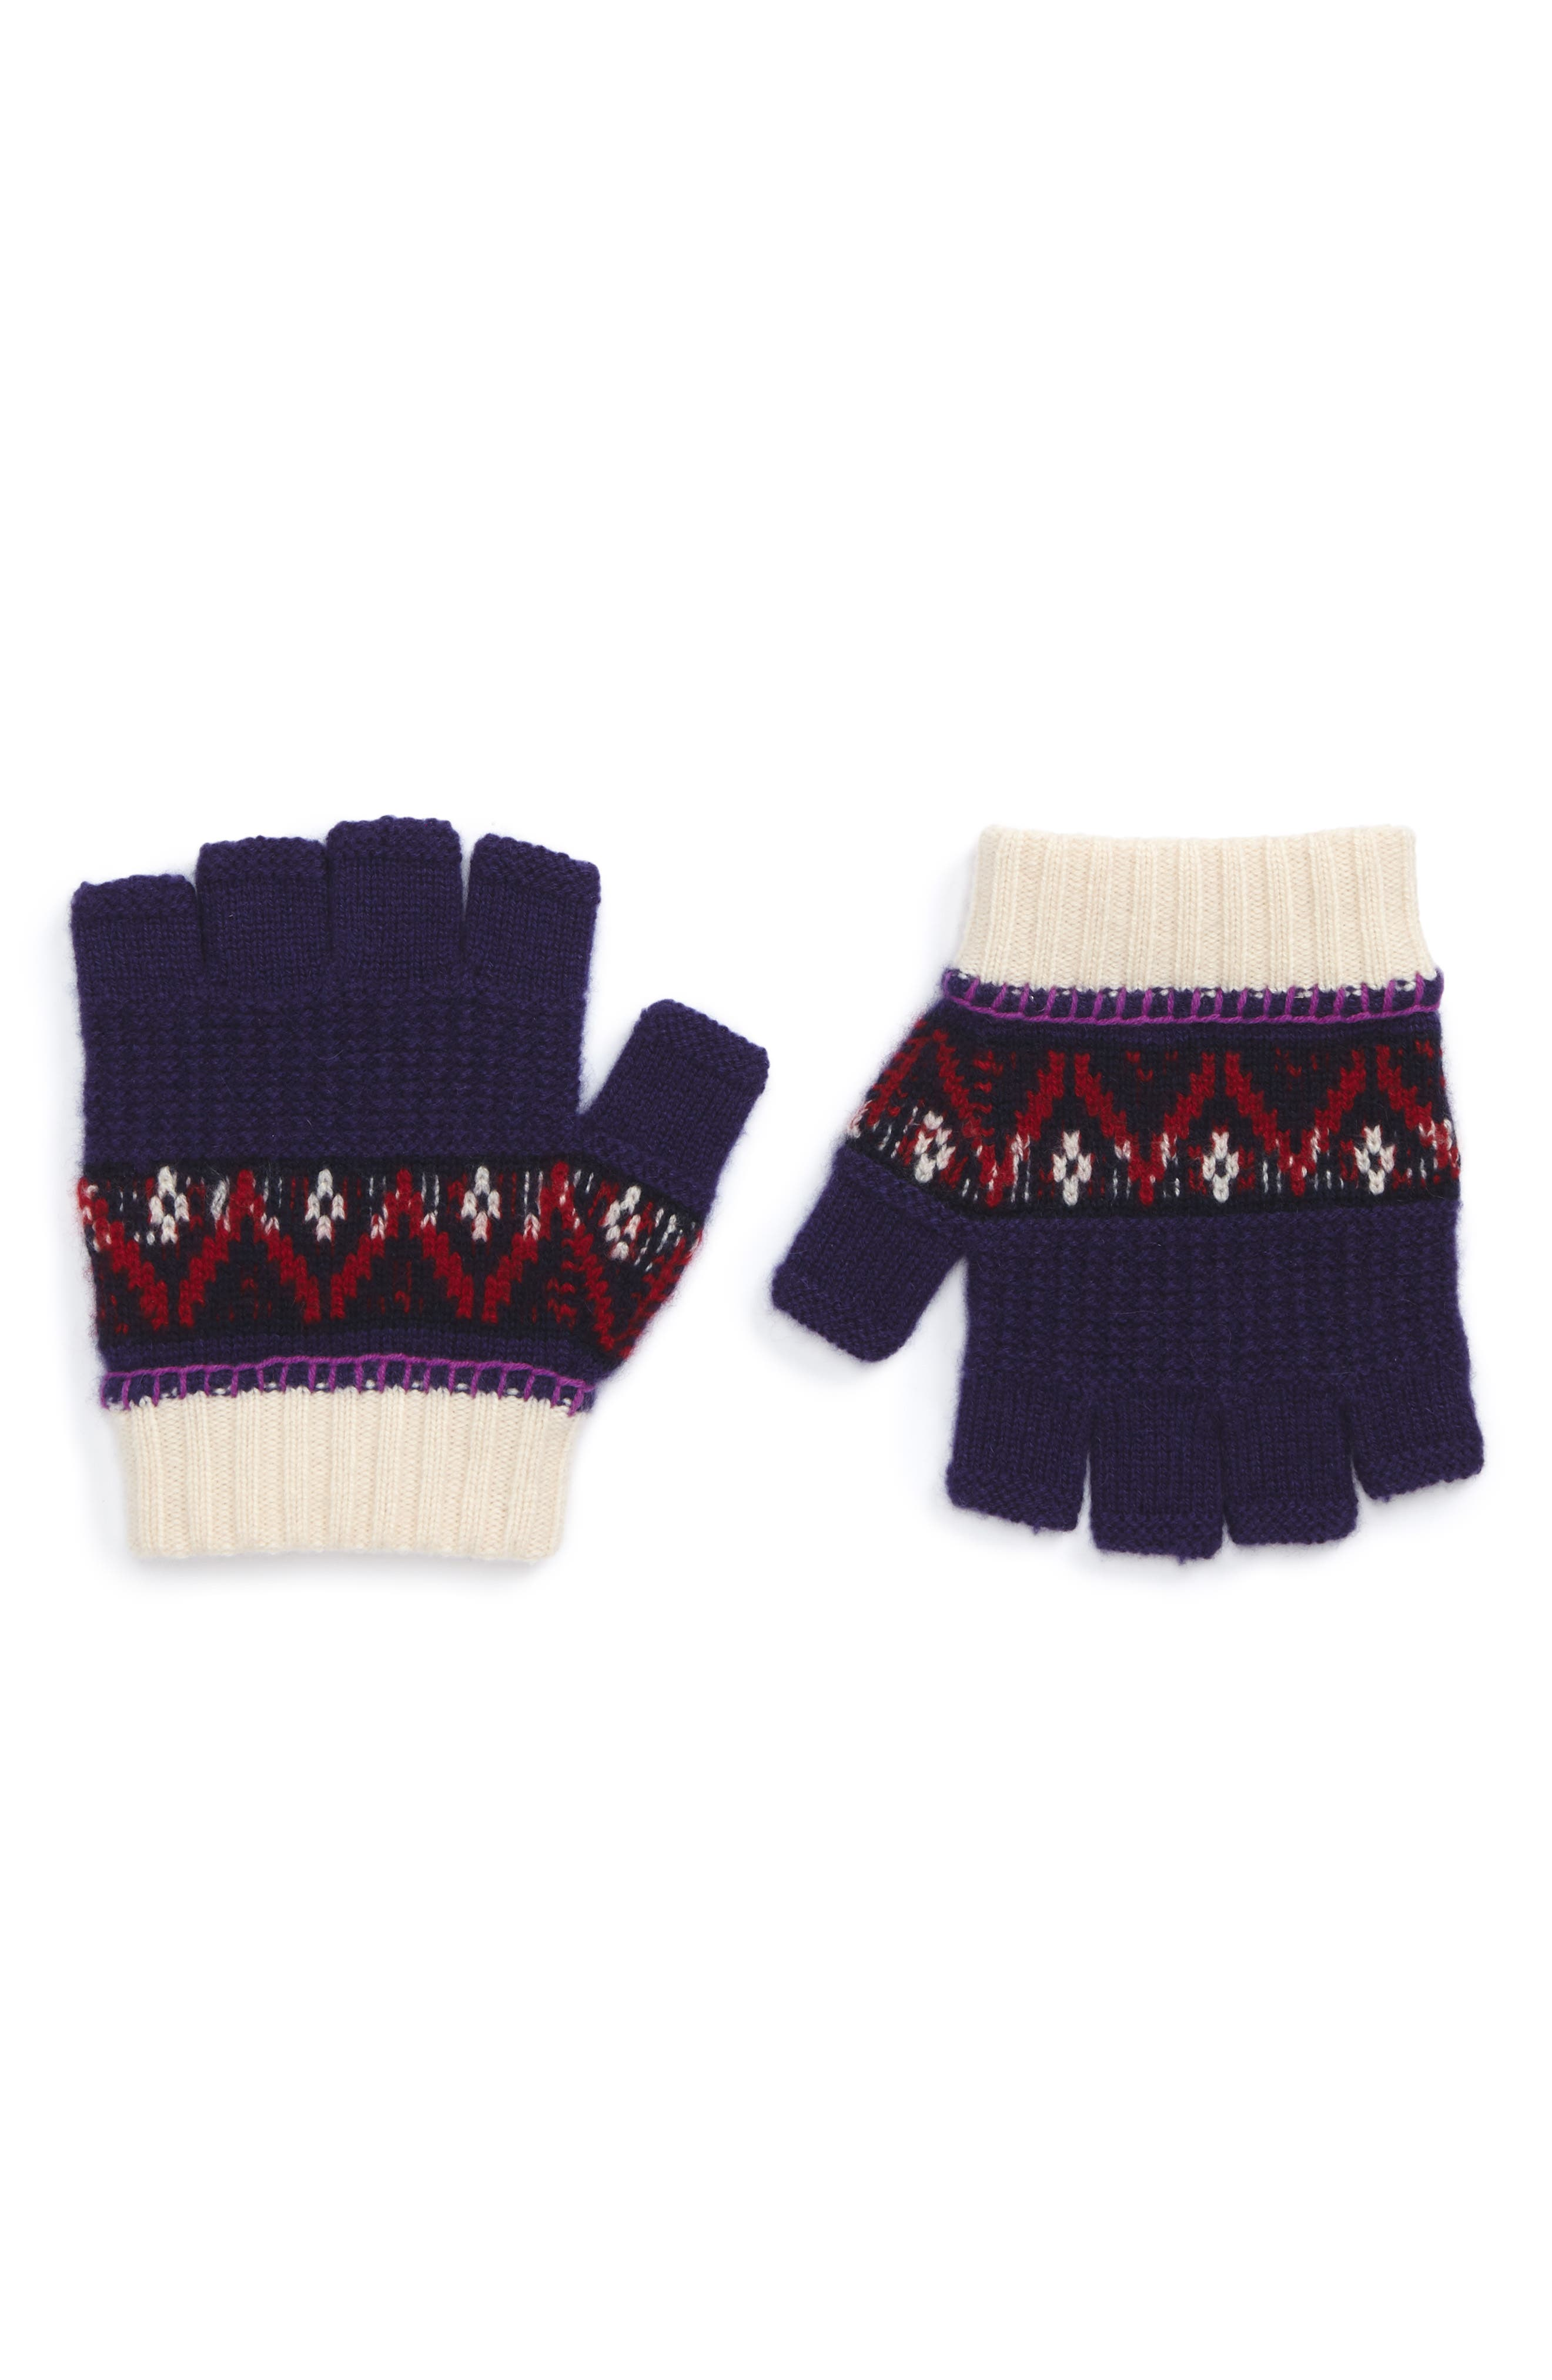 Fair Isle Fingerless Gloves,                             Main thumbnail 1, color,                             500